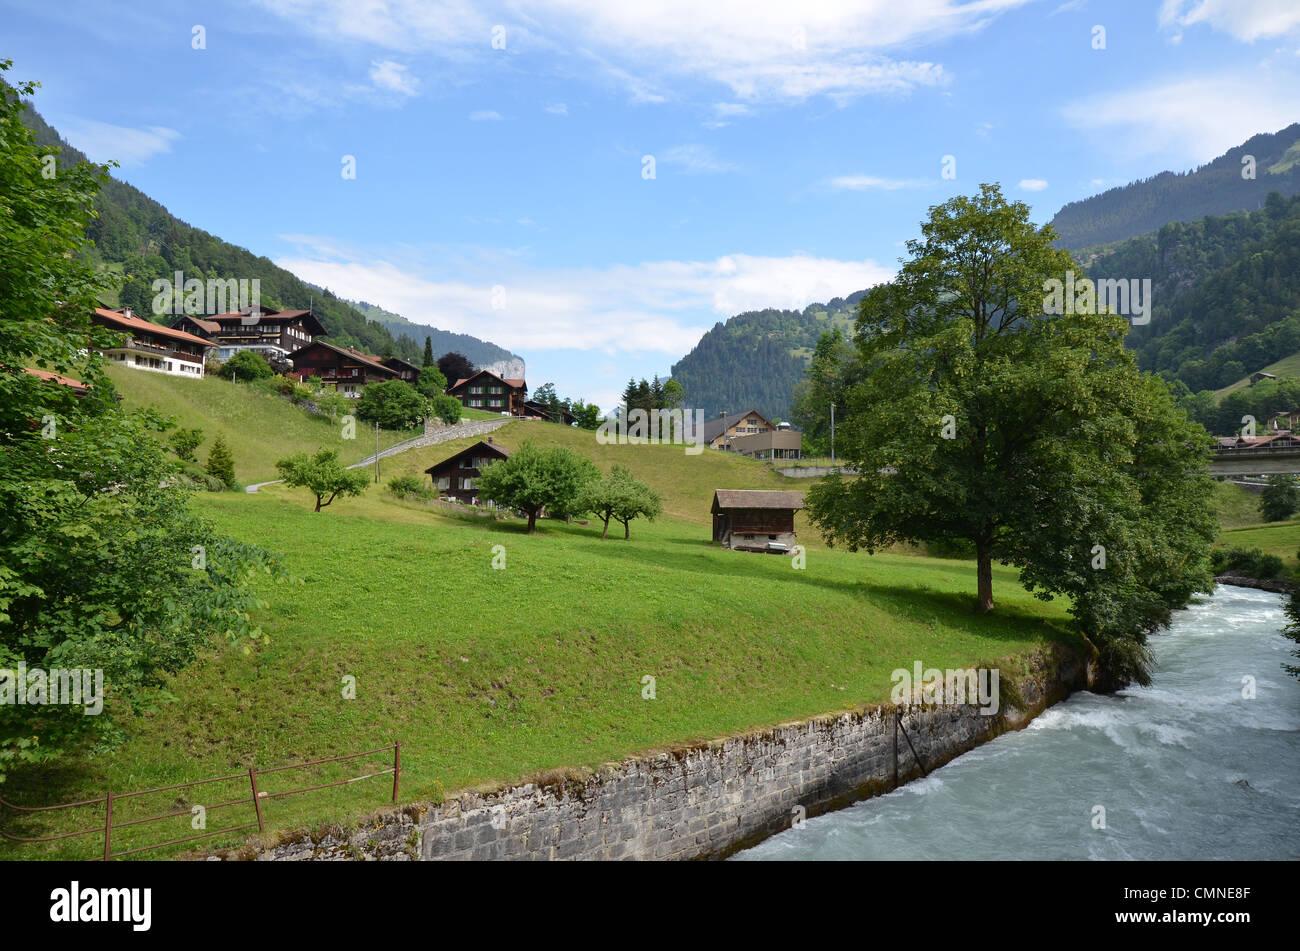 Valley at Lauterbrunnen in Switzerland - Stock Image